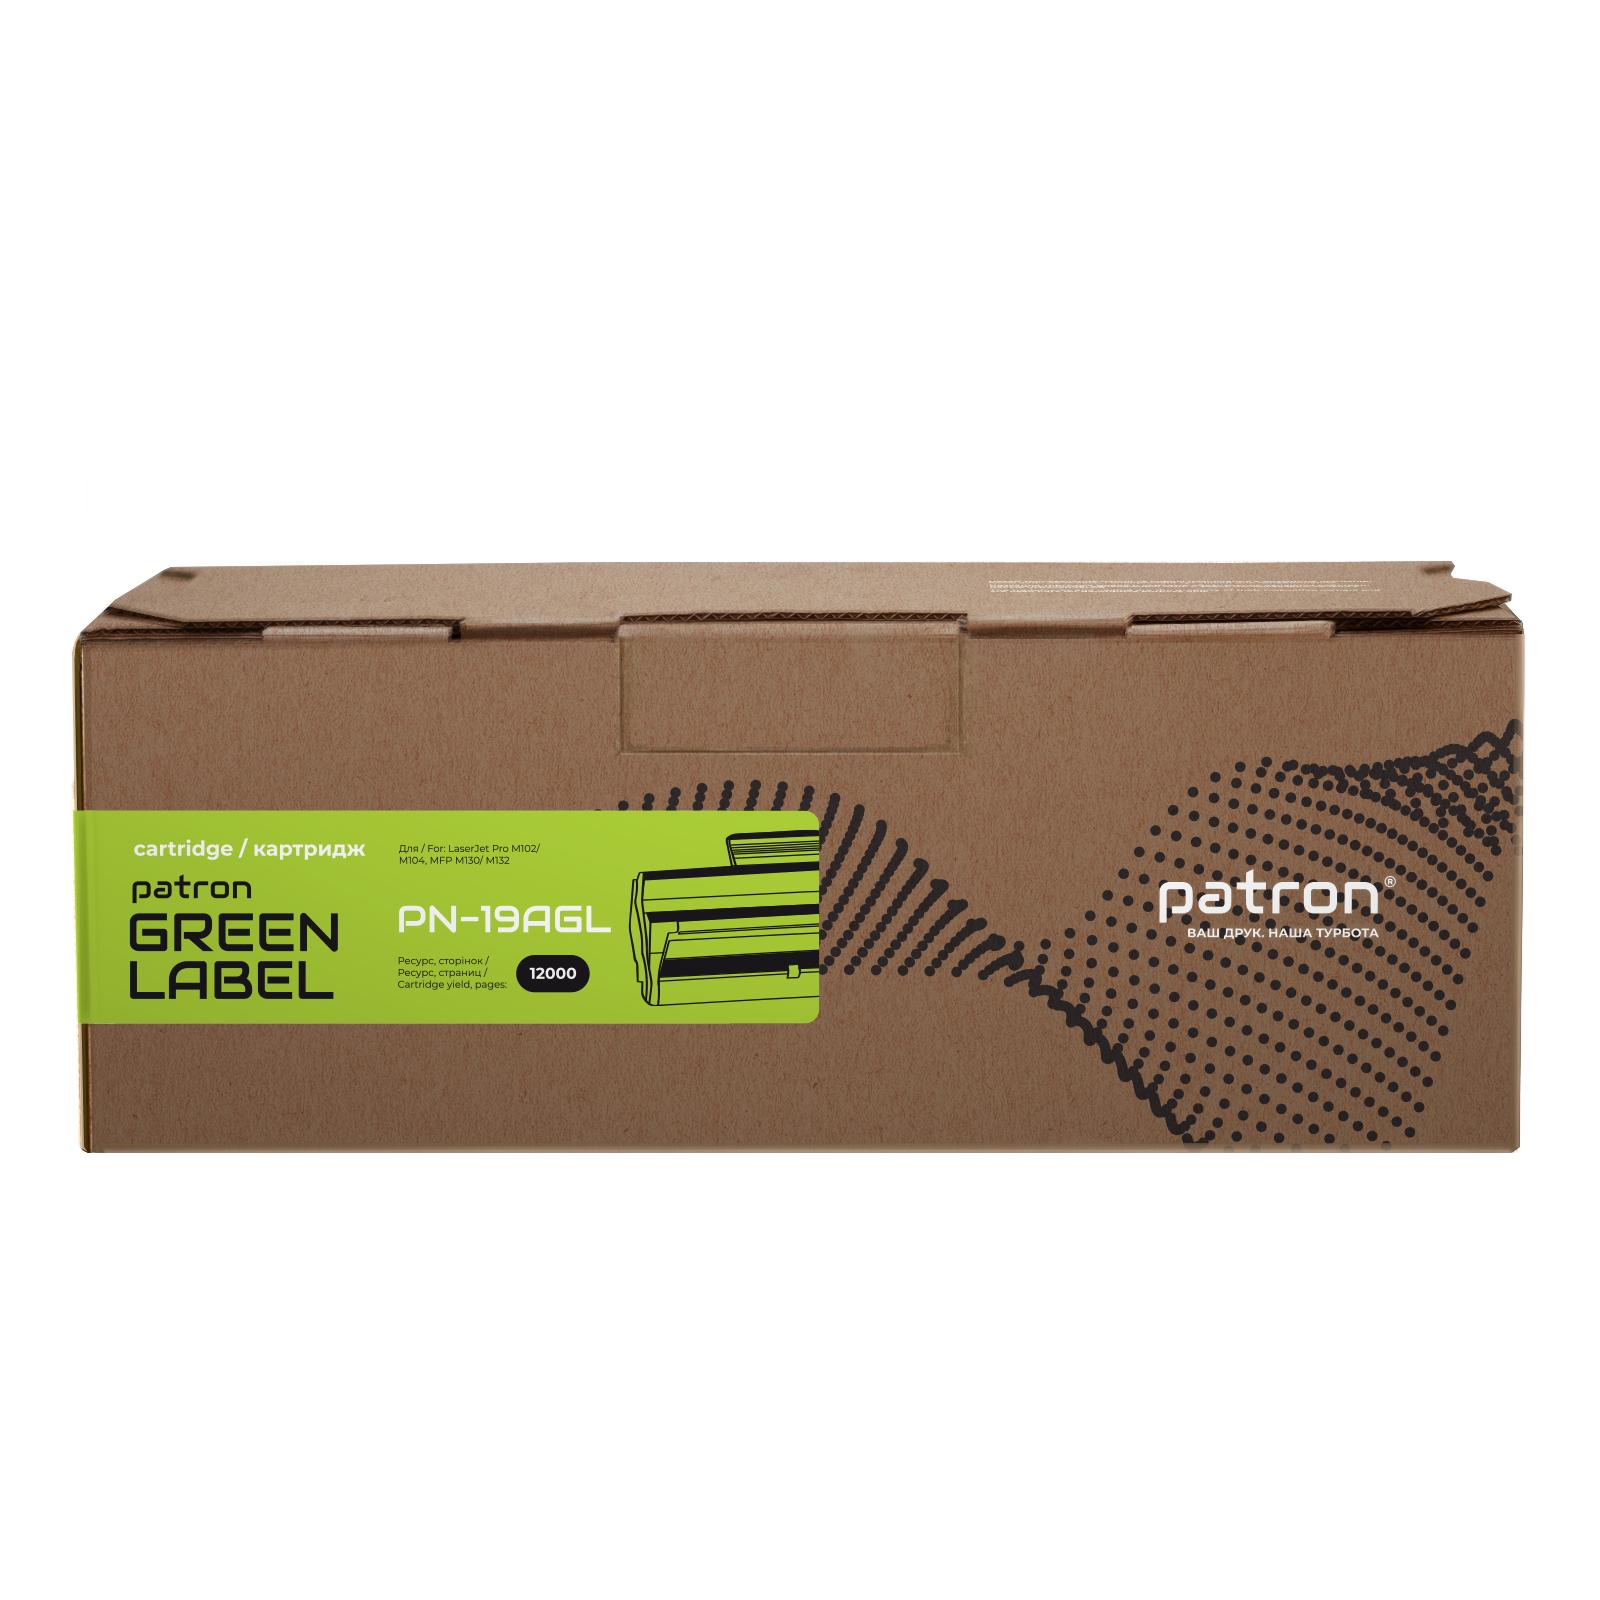 Драм картридж Patron HP LJ CF219A GREEN Label (PN-19AGL) изображение 2